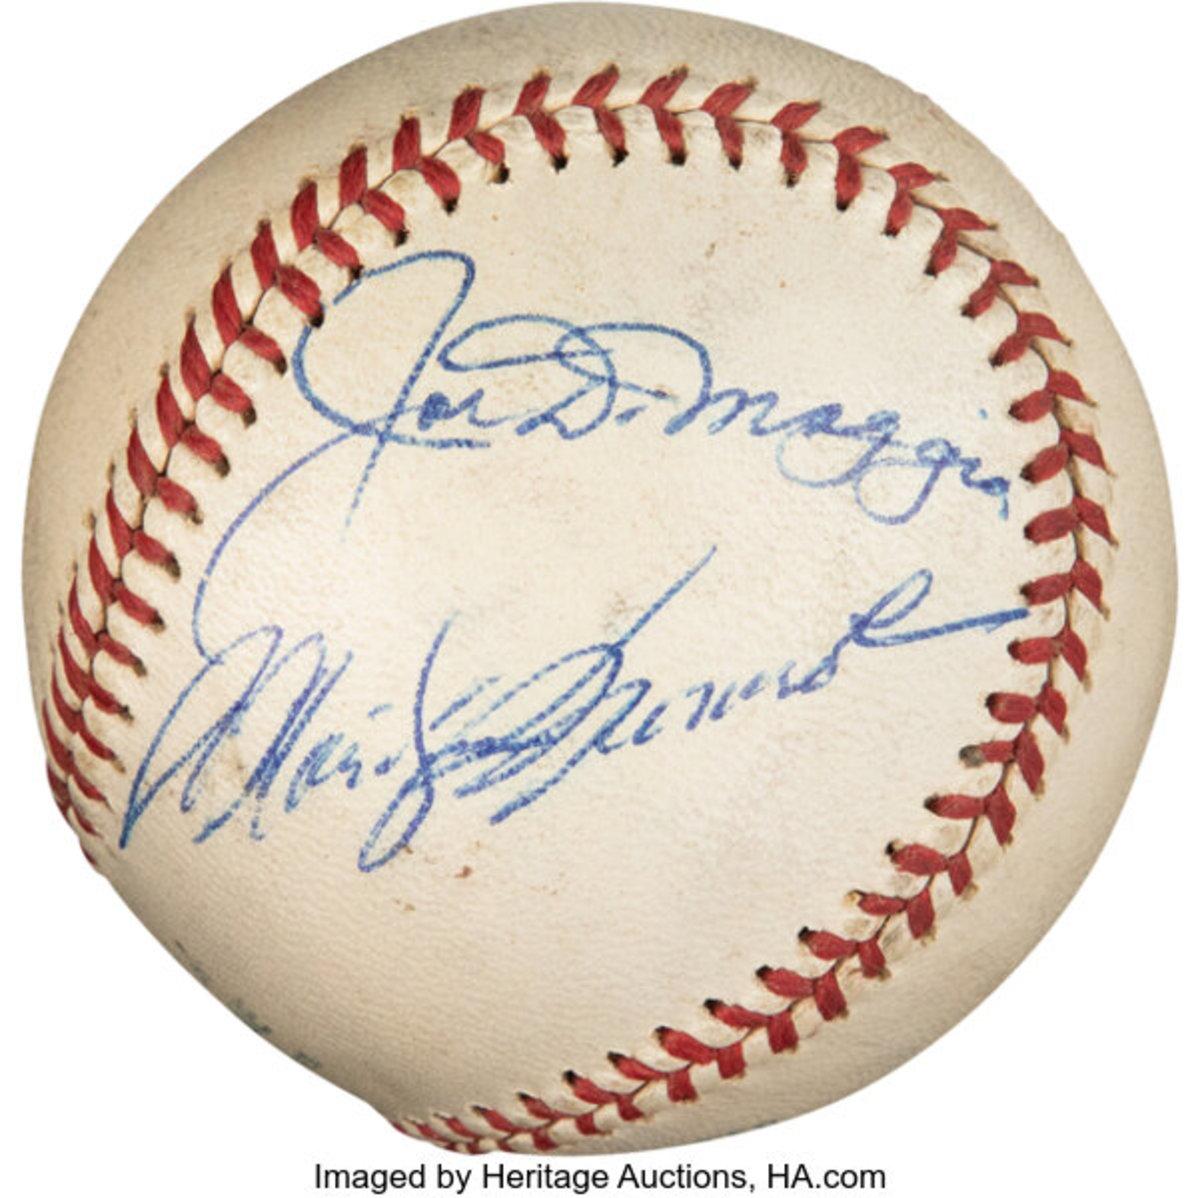 Baseball signed by Joe DiMaggio and Marilyn Monroe.